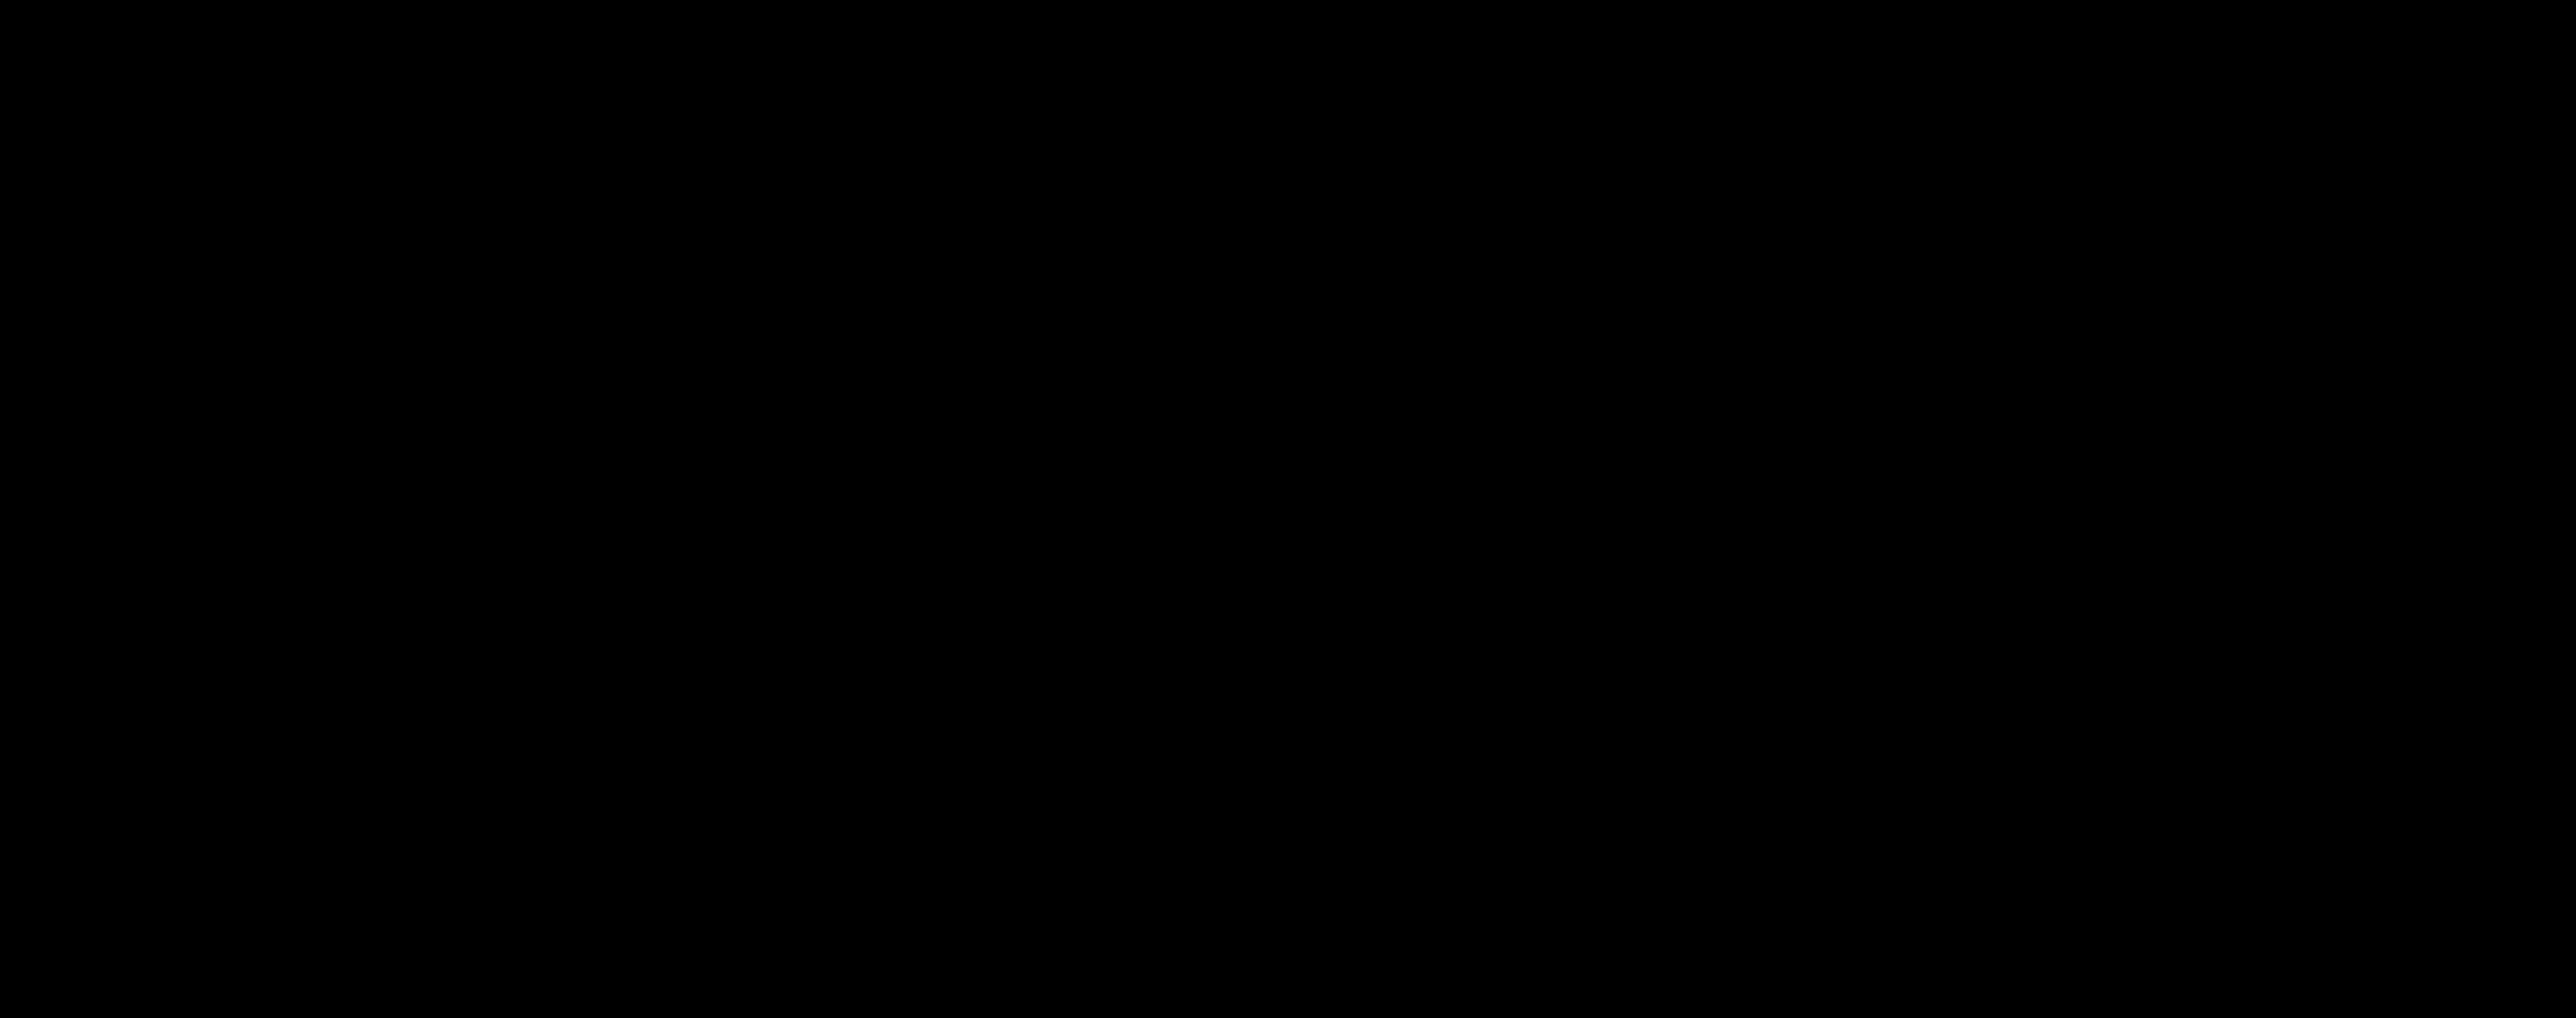 Vungle Logo Black